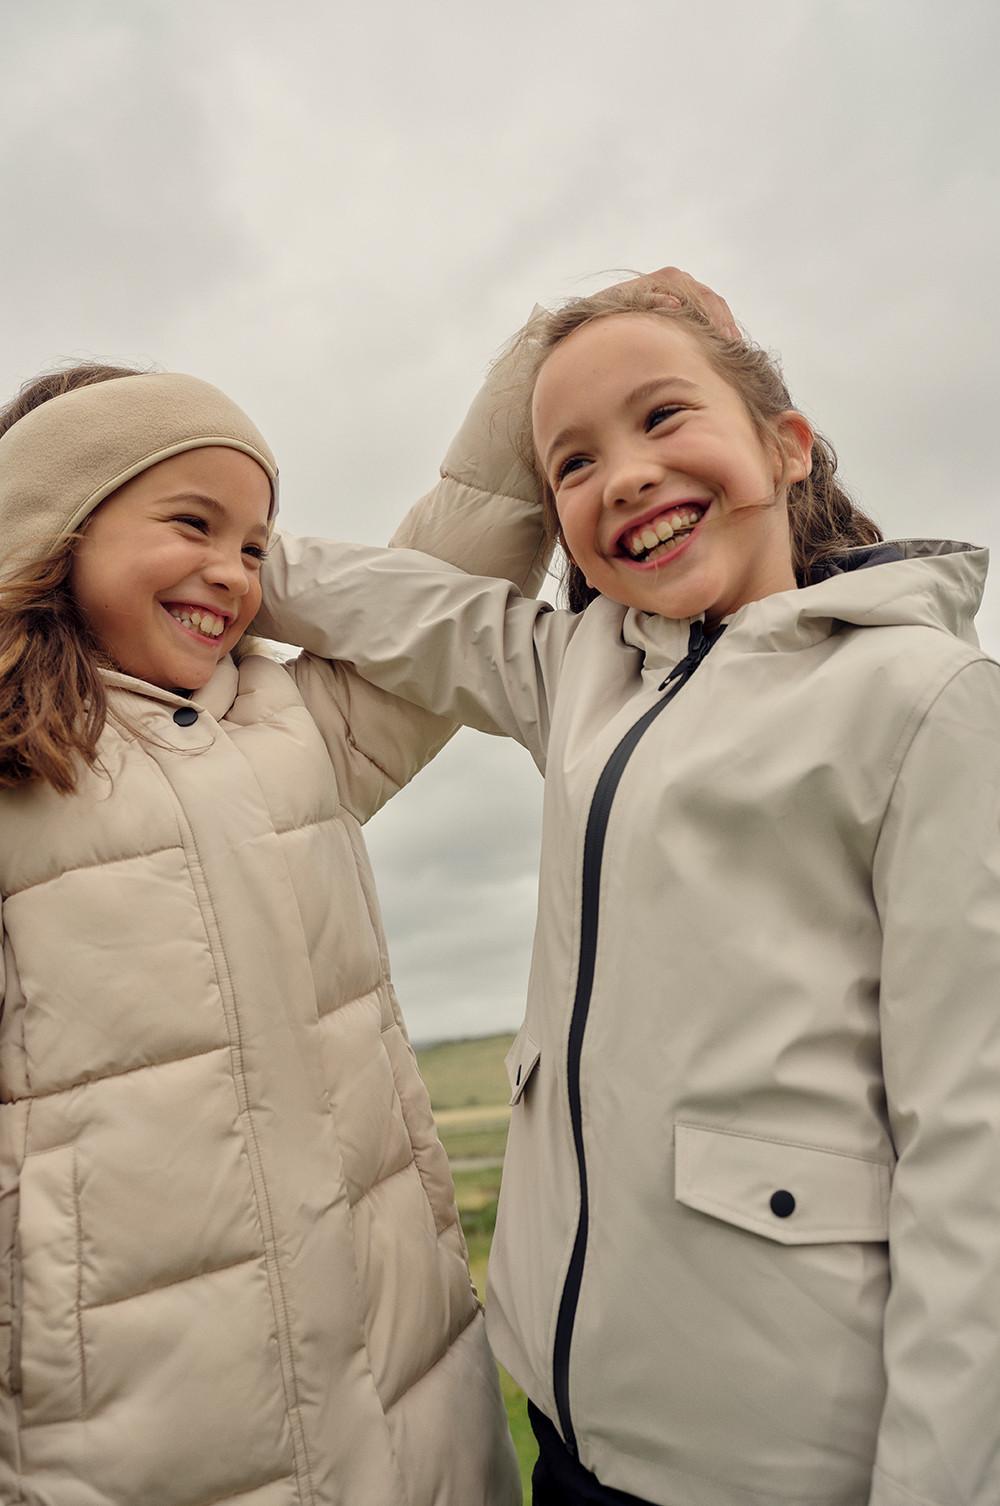 Twee glimlachende meisjes met crèmekleurige puffer- en regenjassen